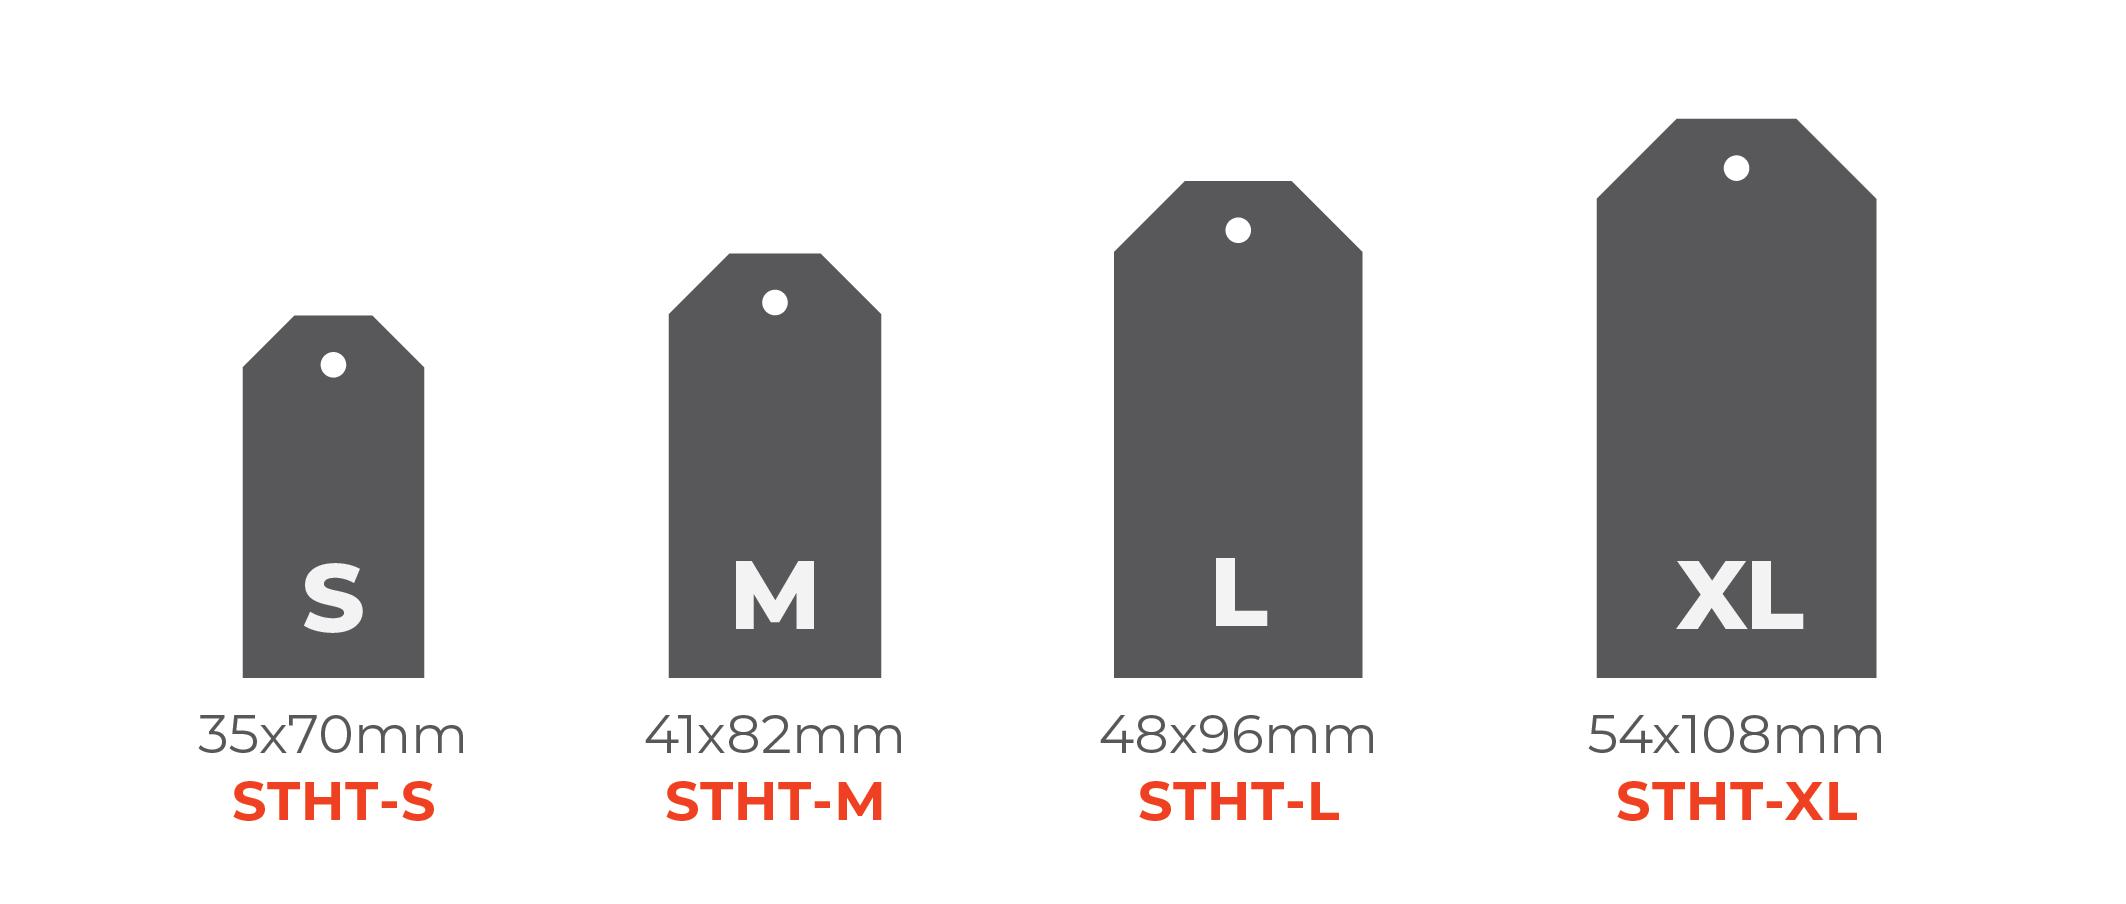 Standard Hang Tags - Standard Tags 0x0mm 01 Image